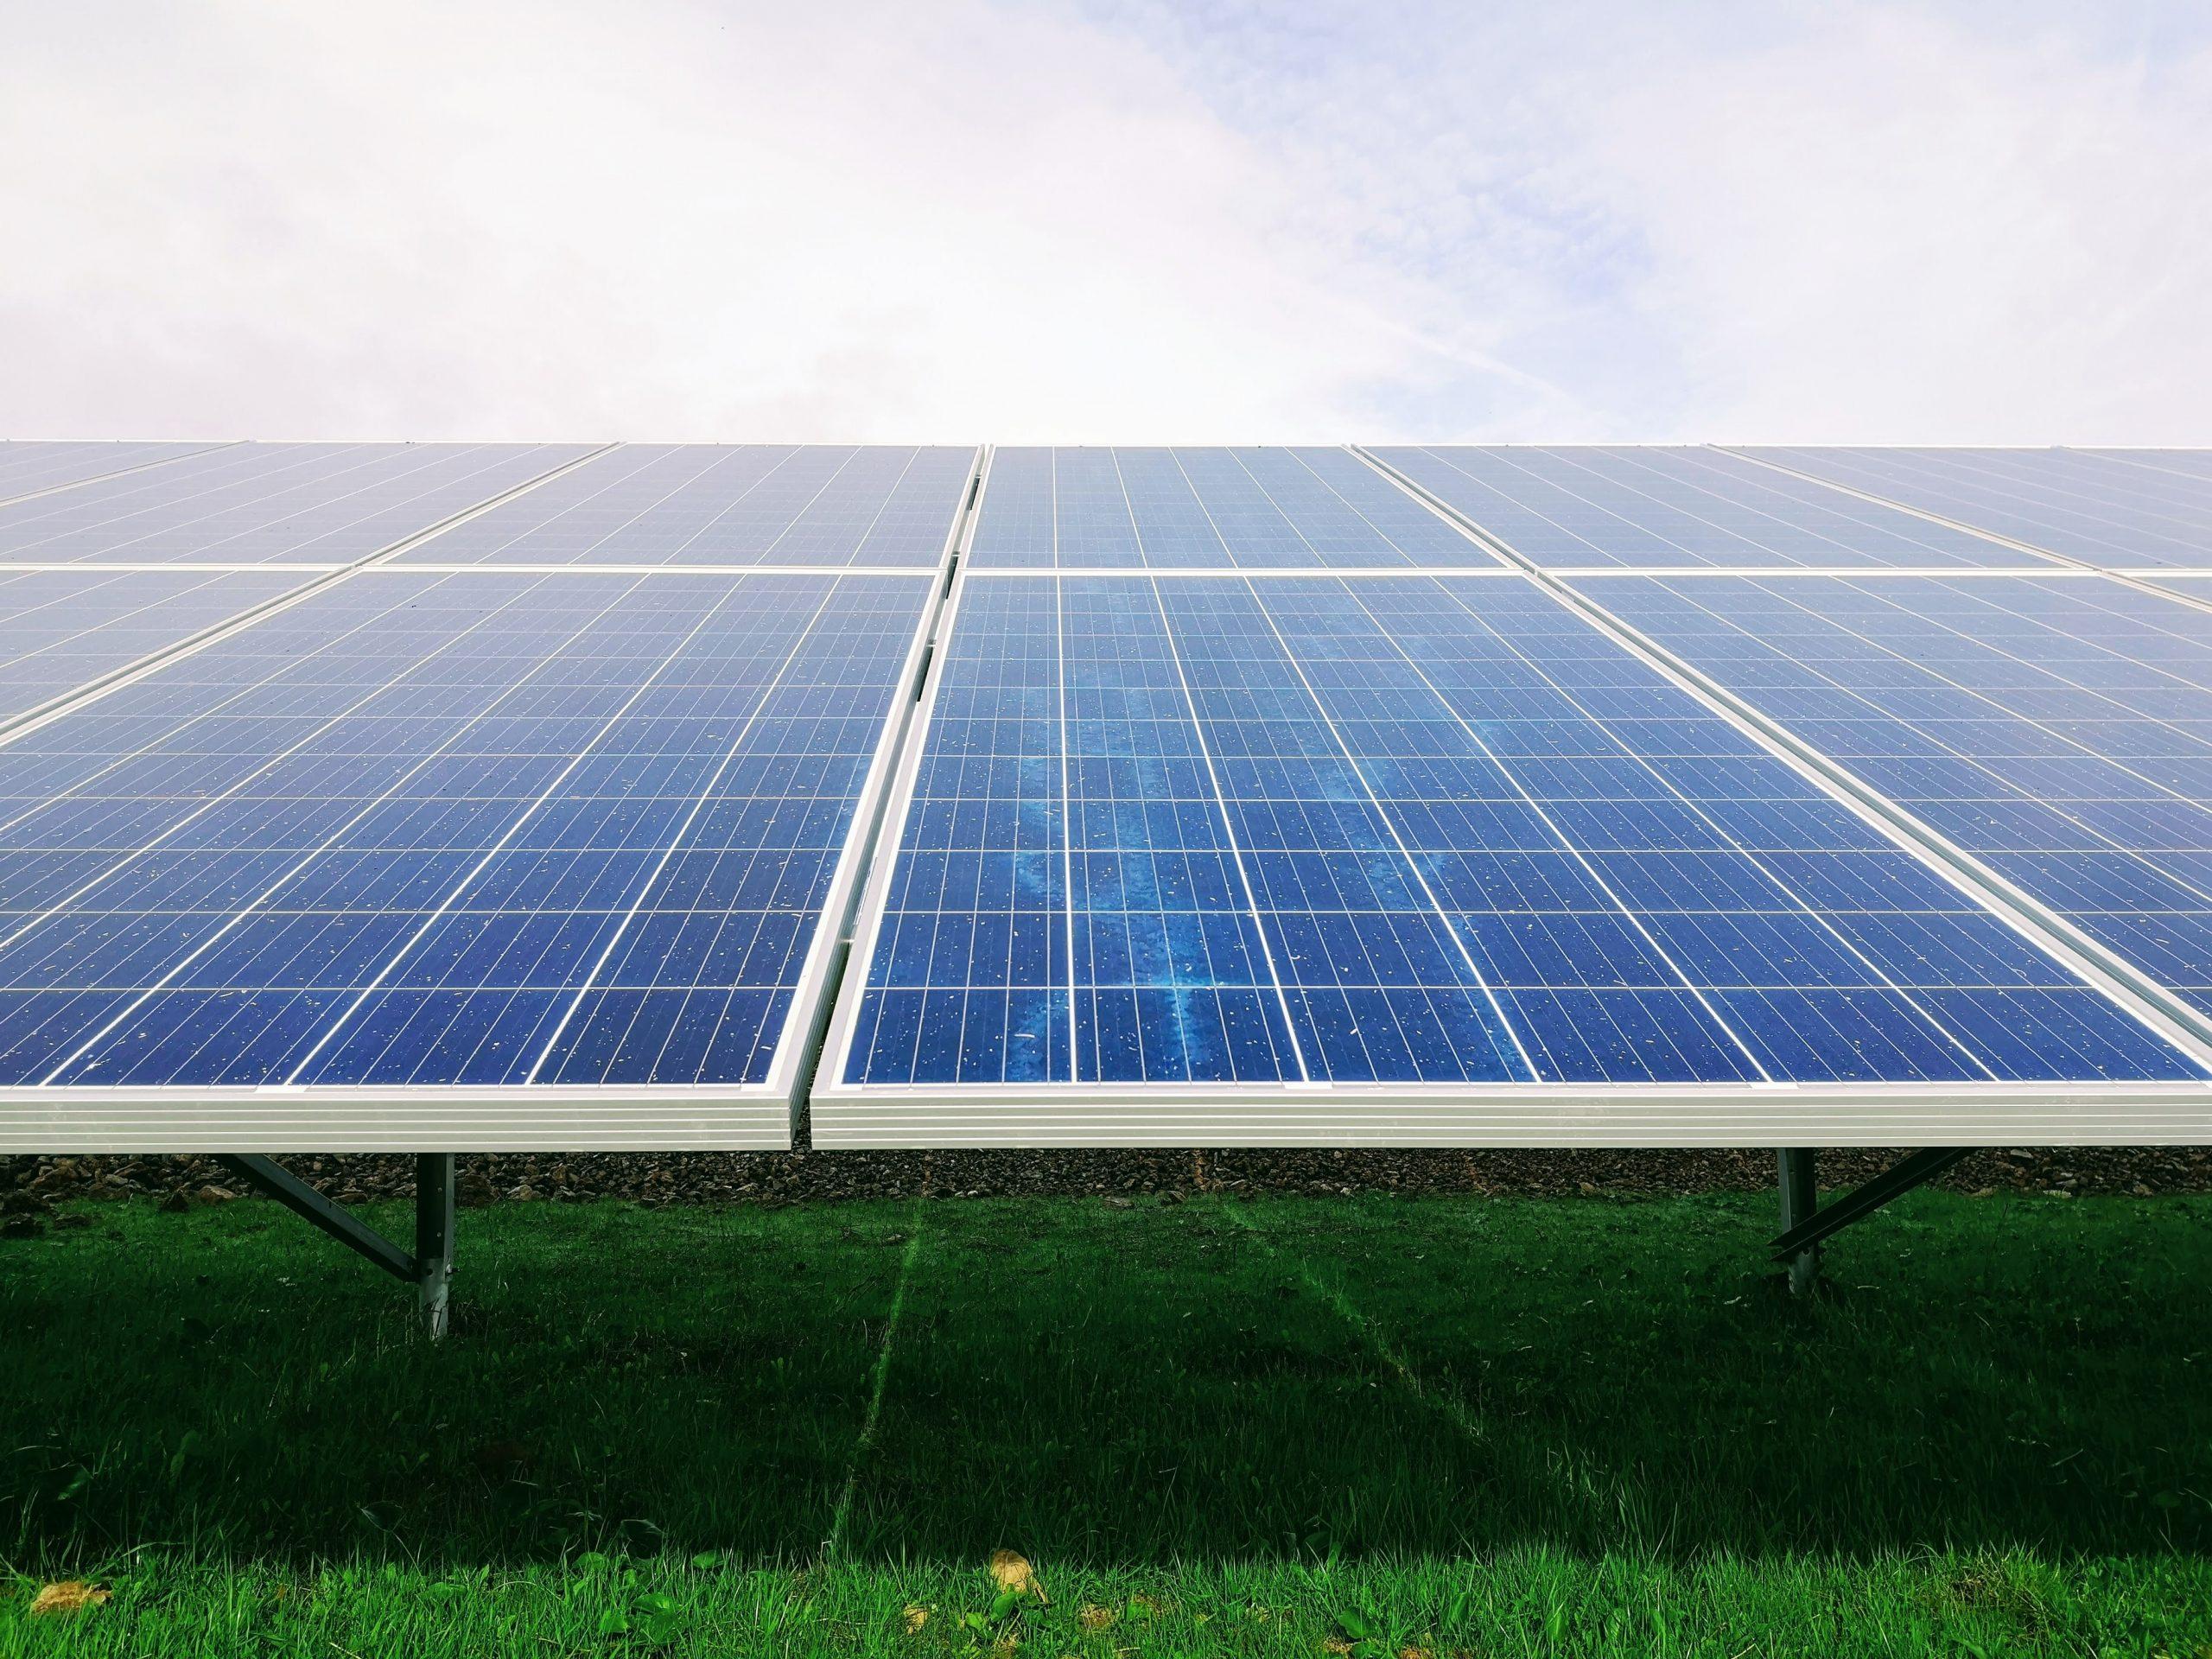 España potencia europea en producción de energía solar